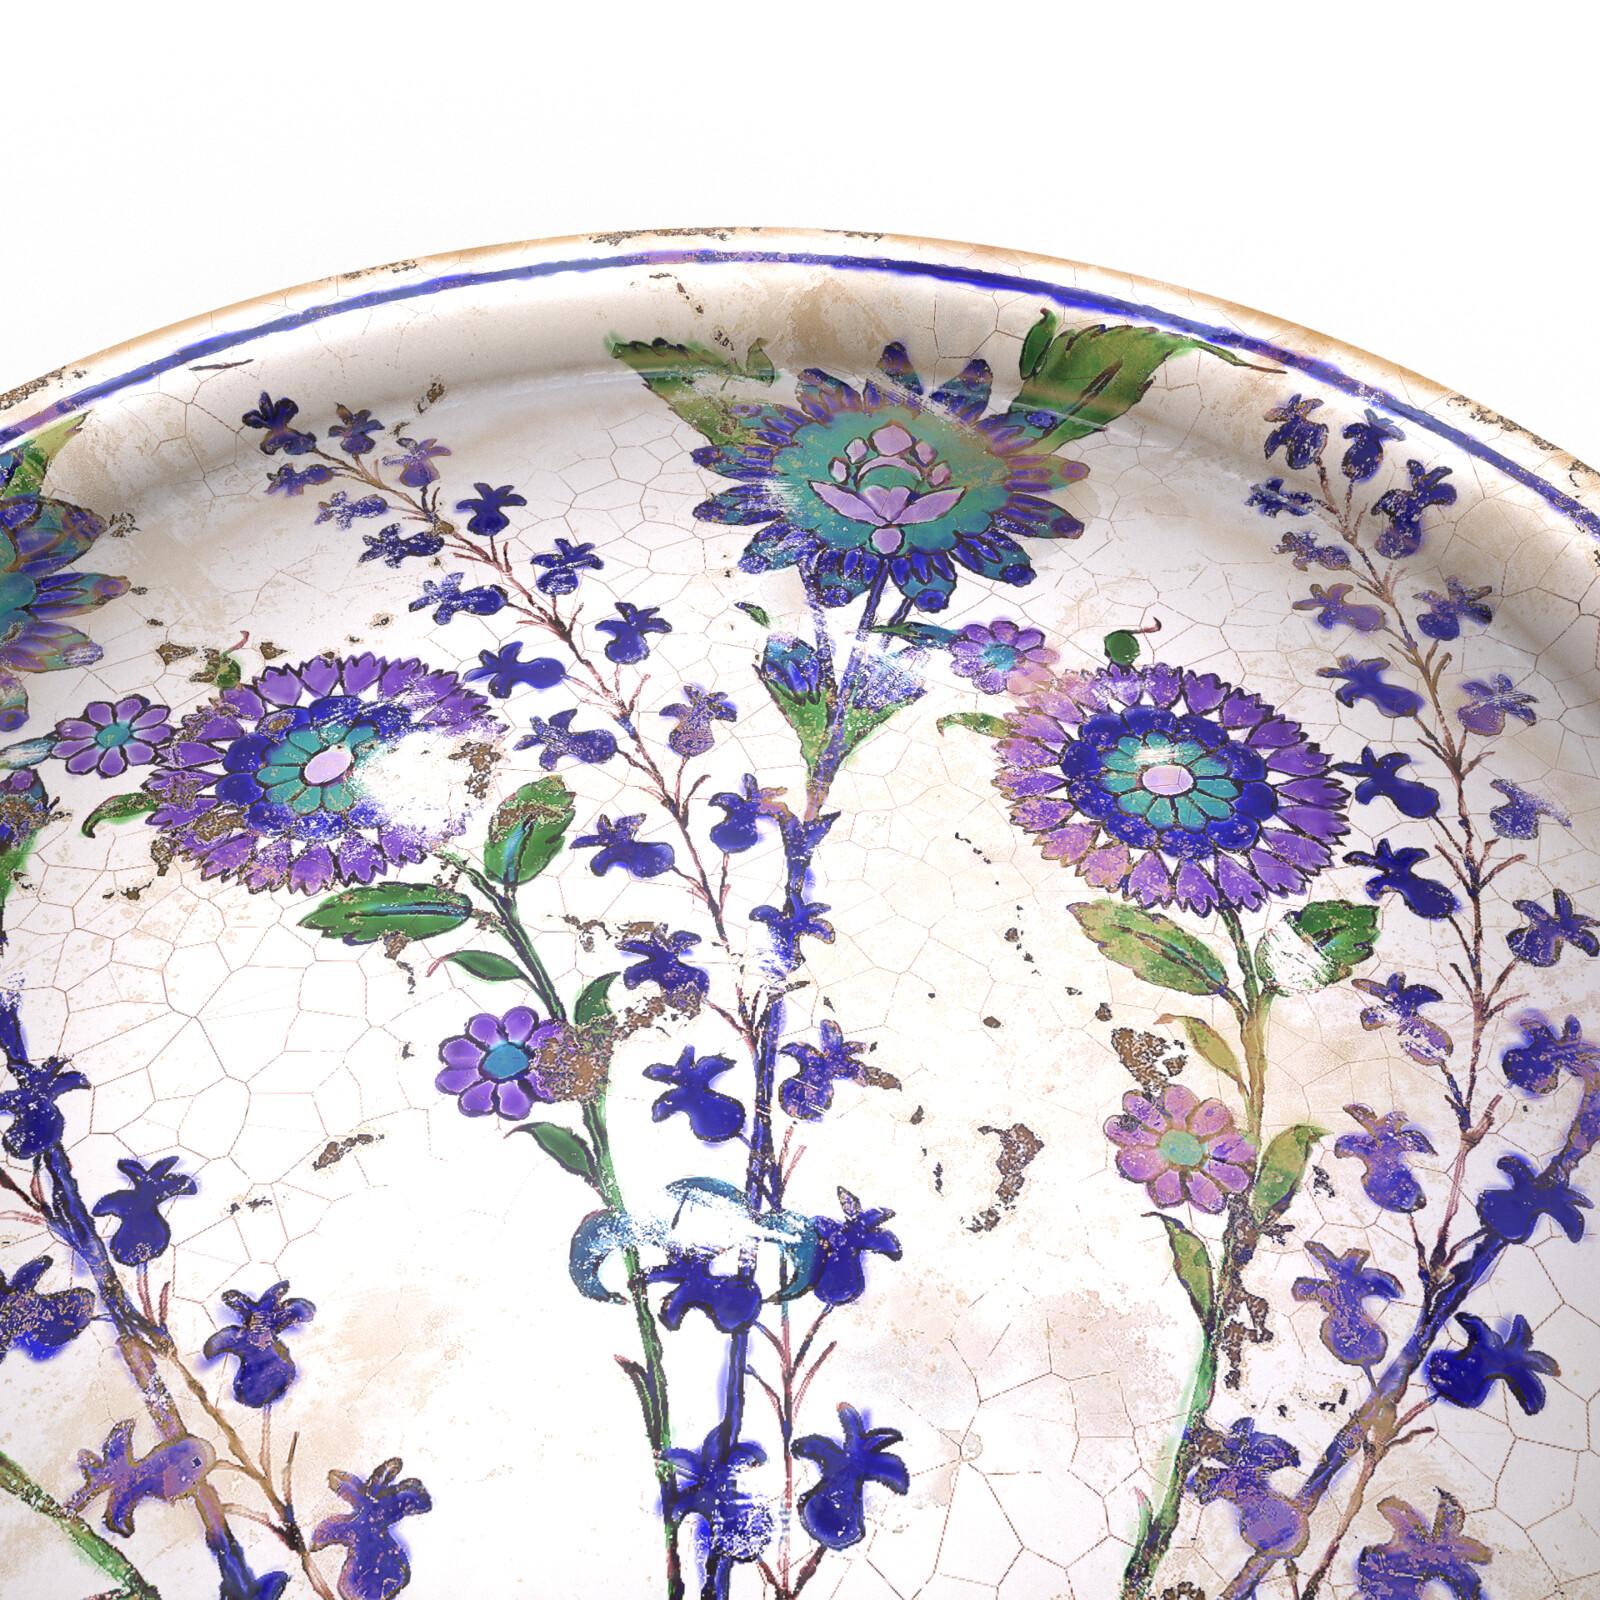 Damascus style ceramic dish, iRay Render